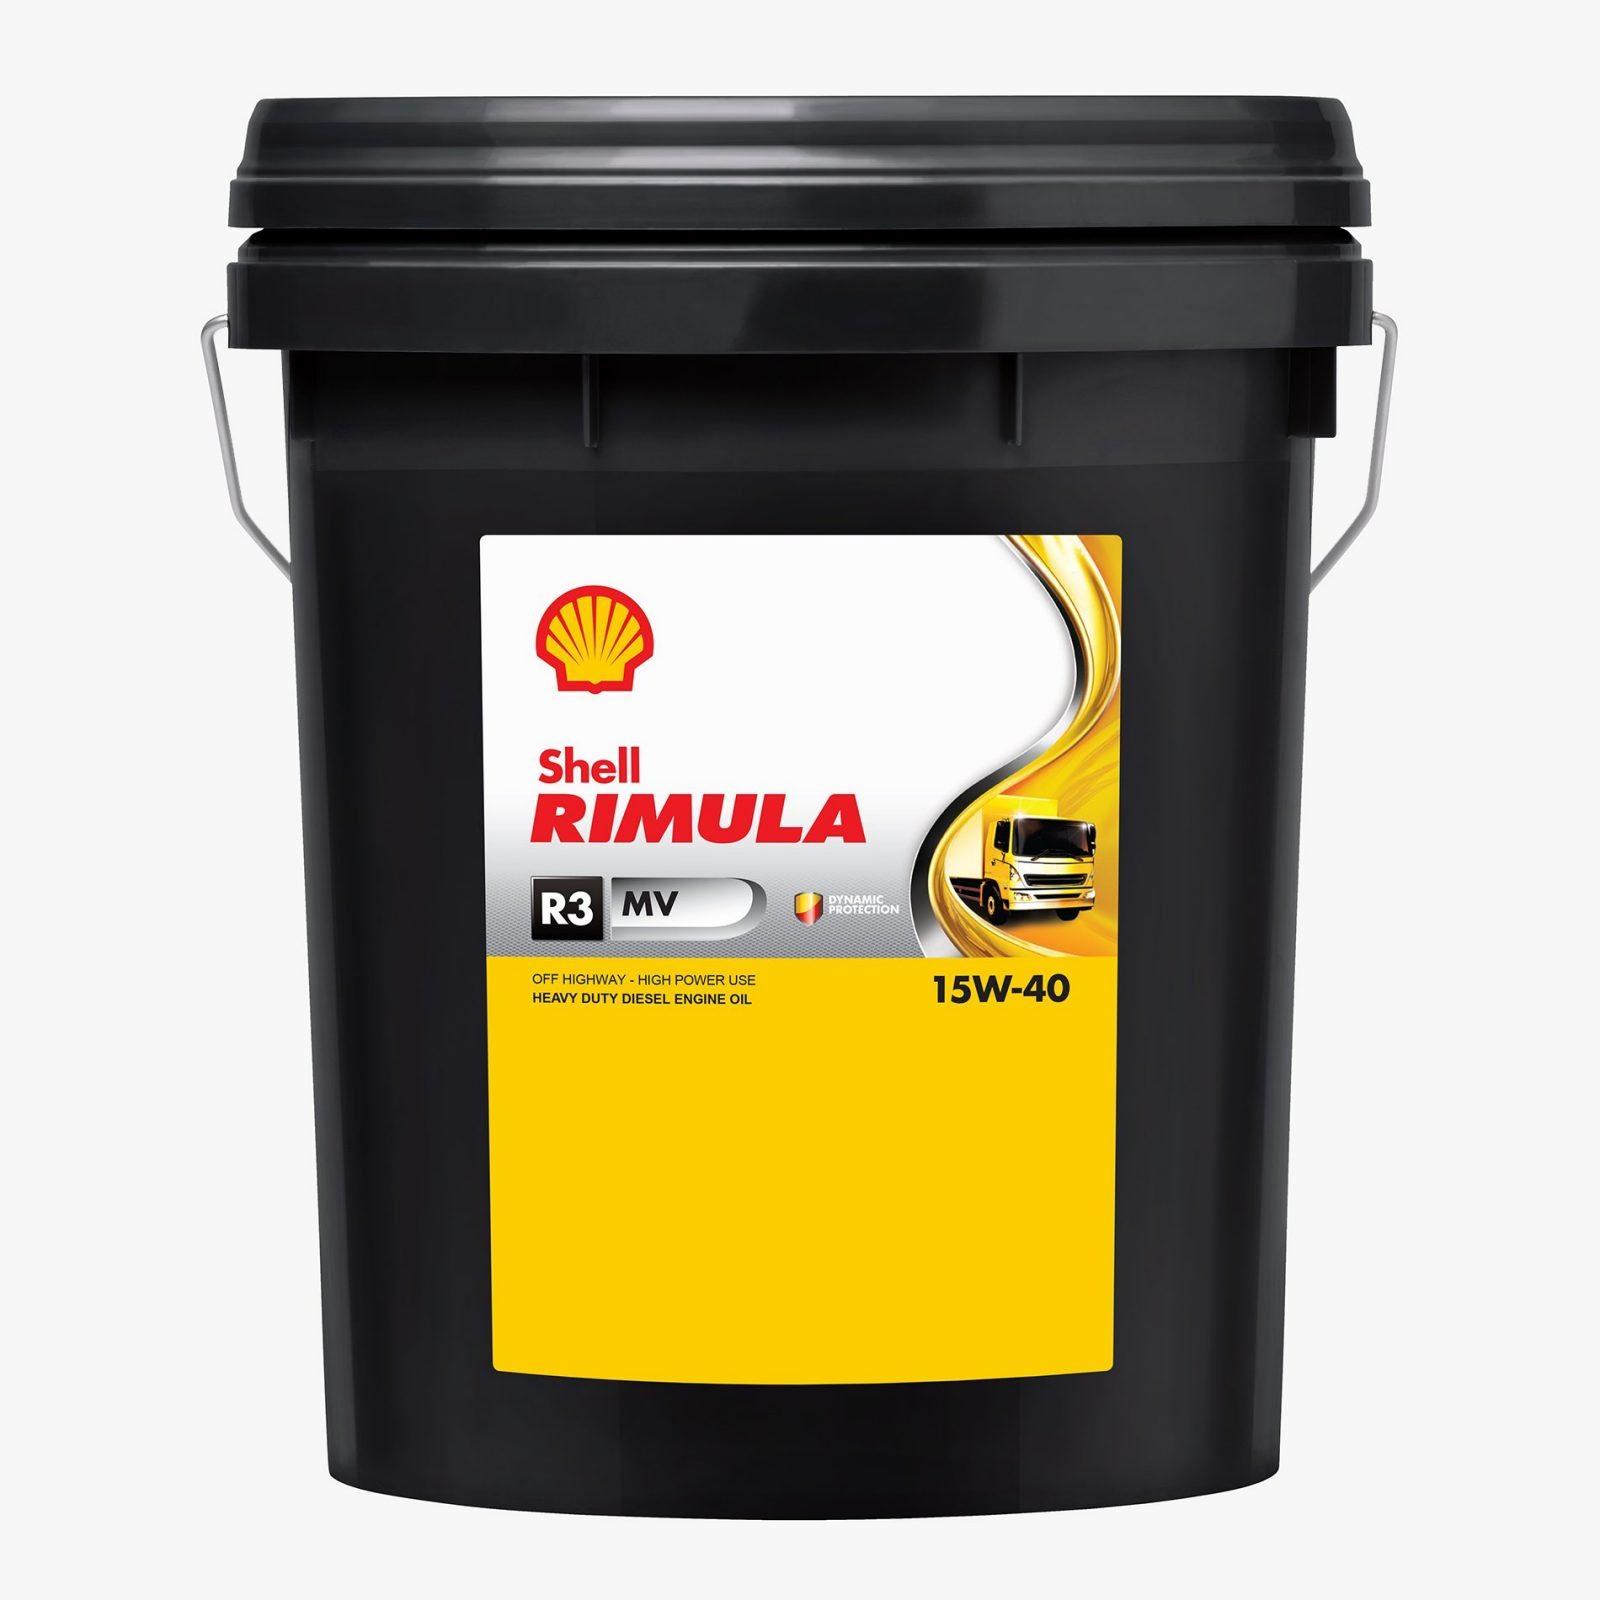 Shell Rimula R3 MV